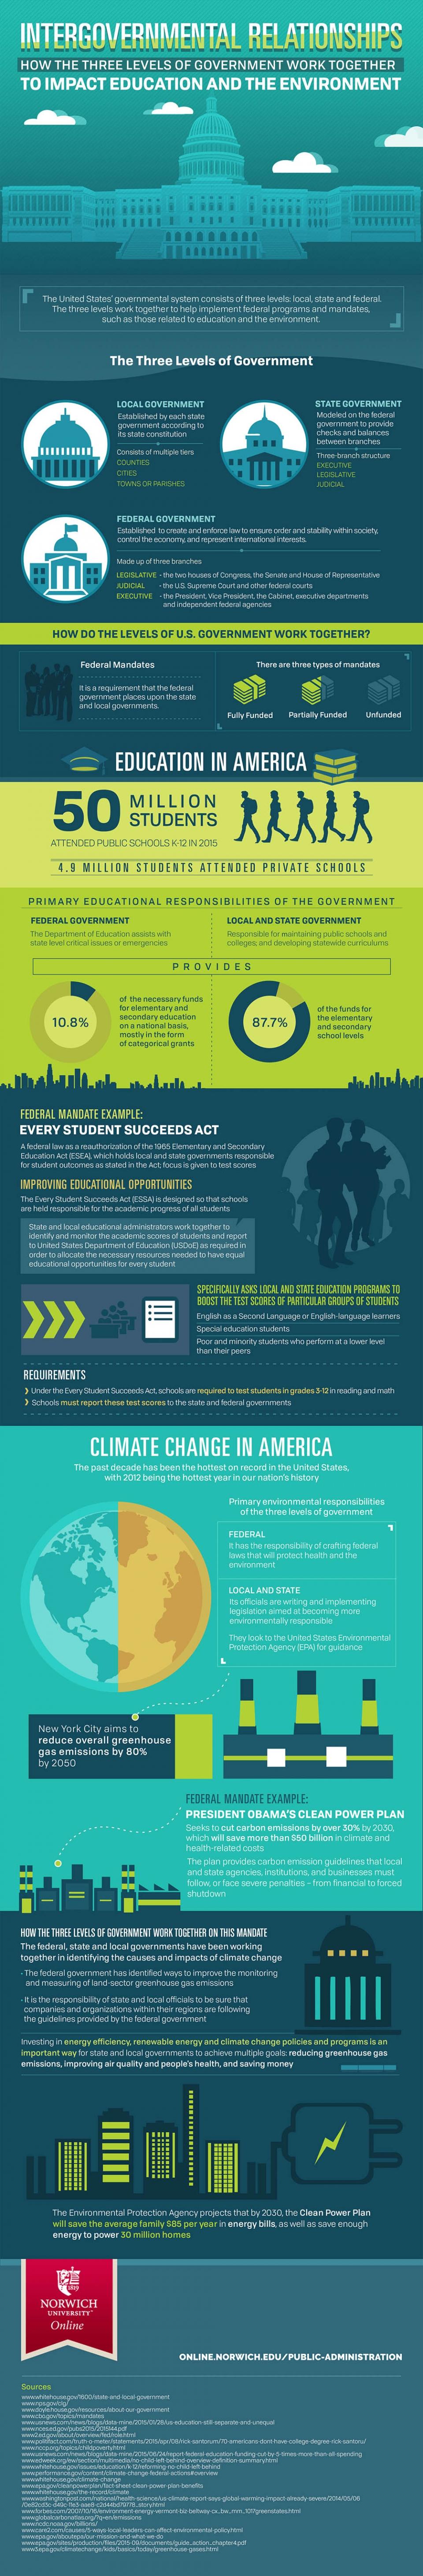 intergovernmental relationships infographic image